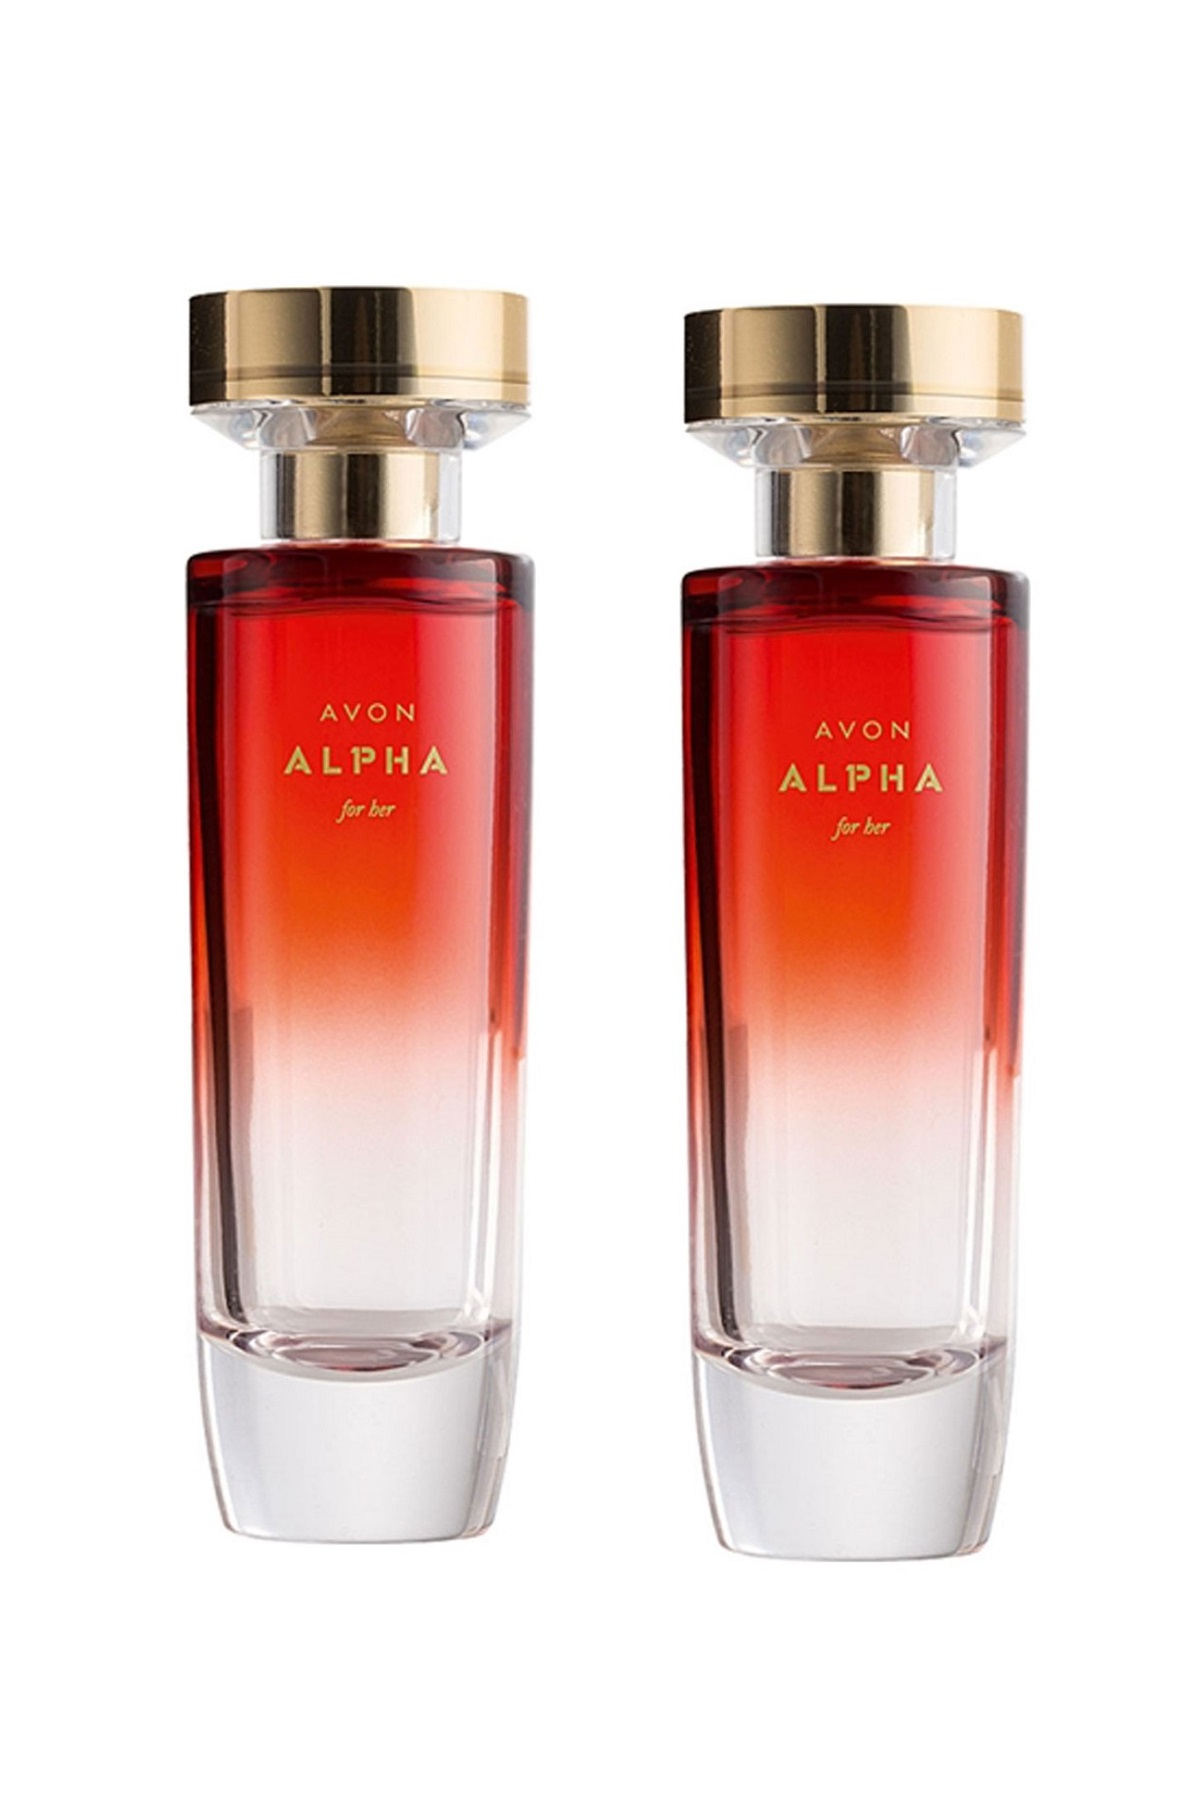 Alpha - ryuklemobi